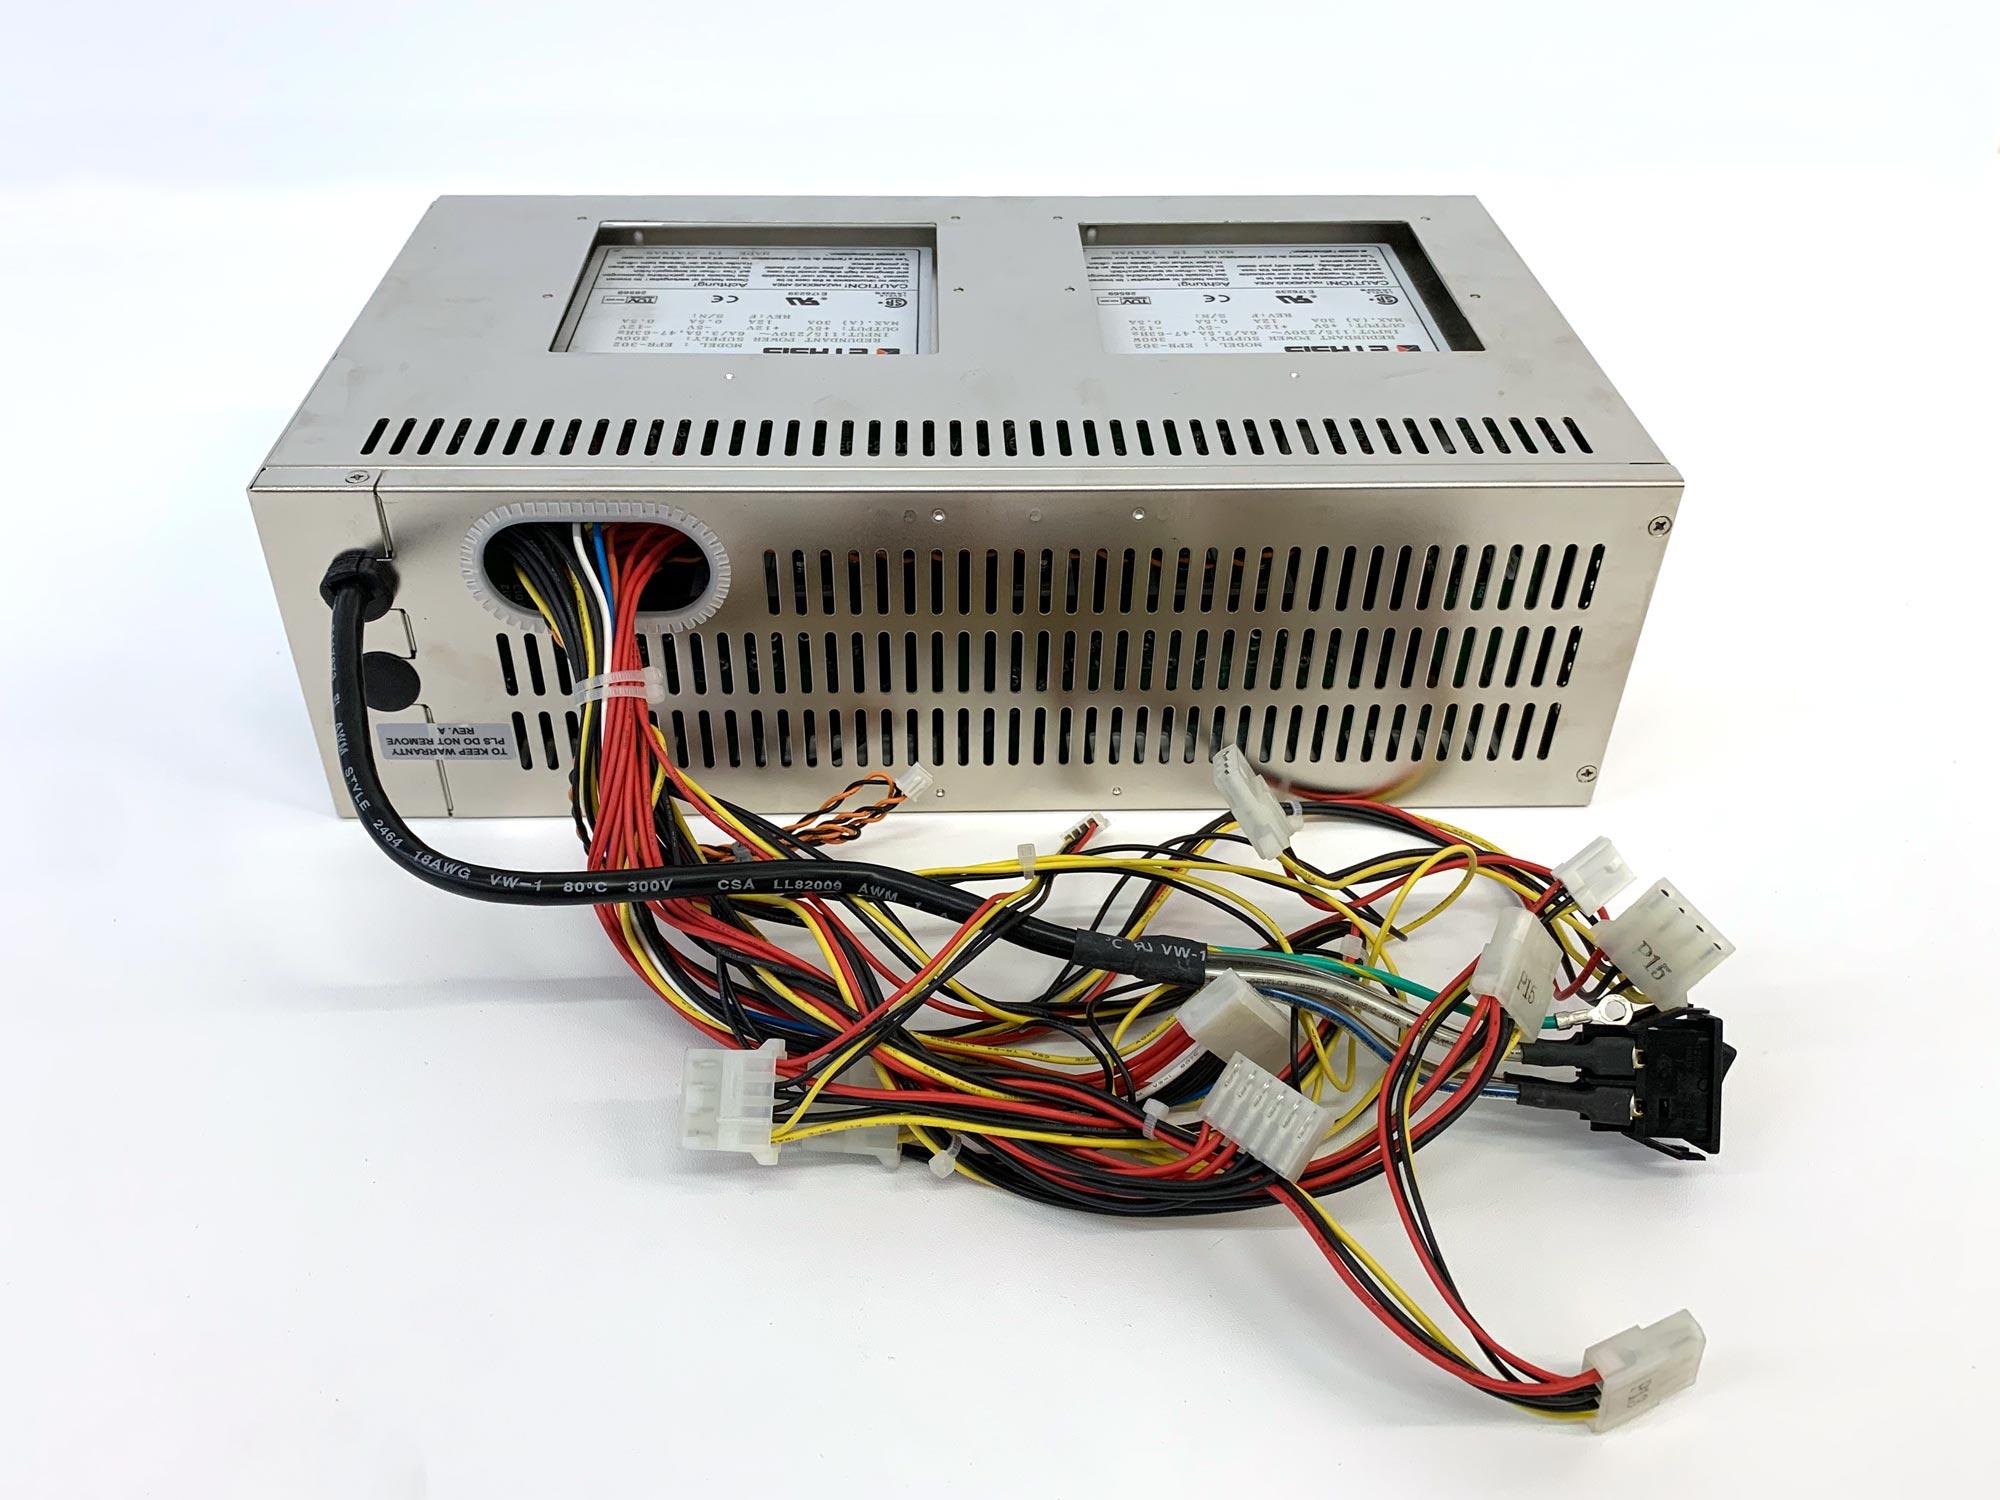 Etasis EPR-2302H - 300W IPC Netzteil, redundant